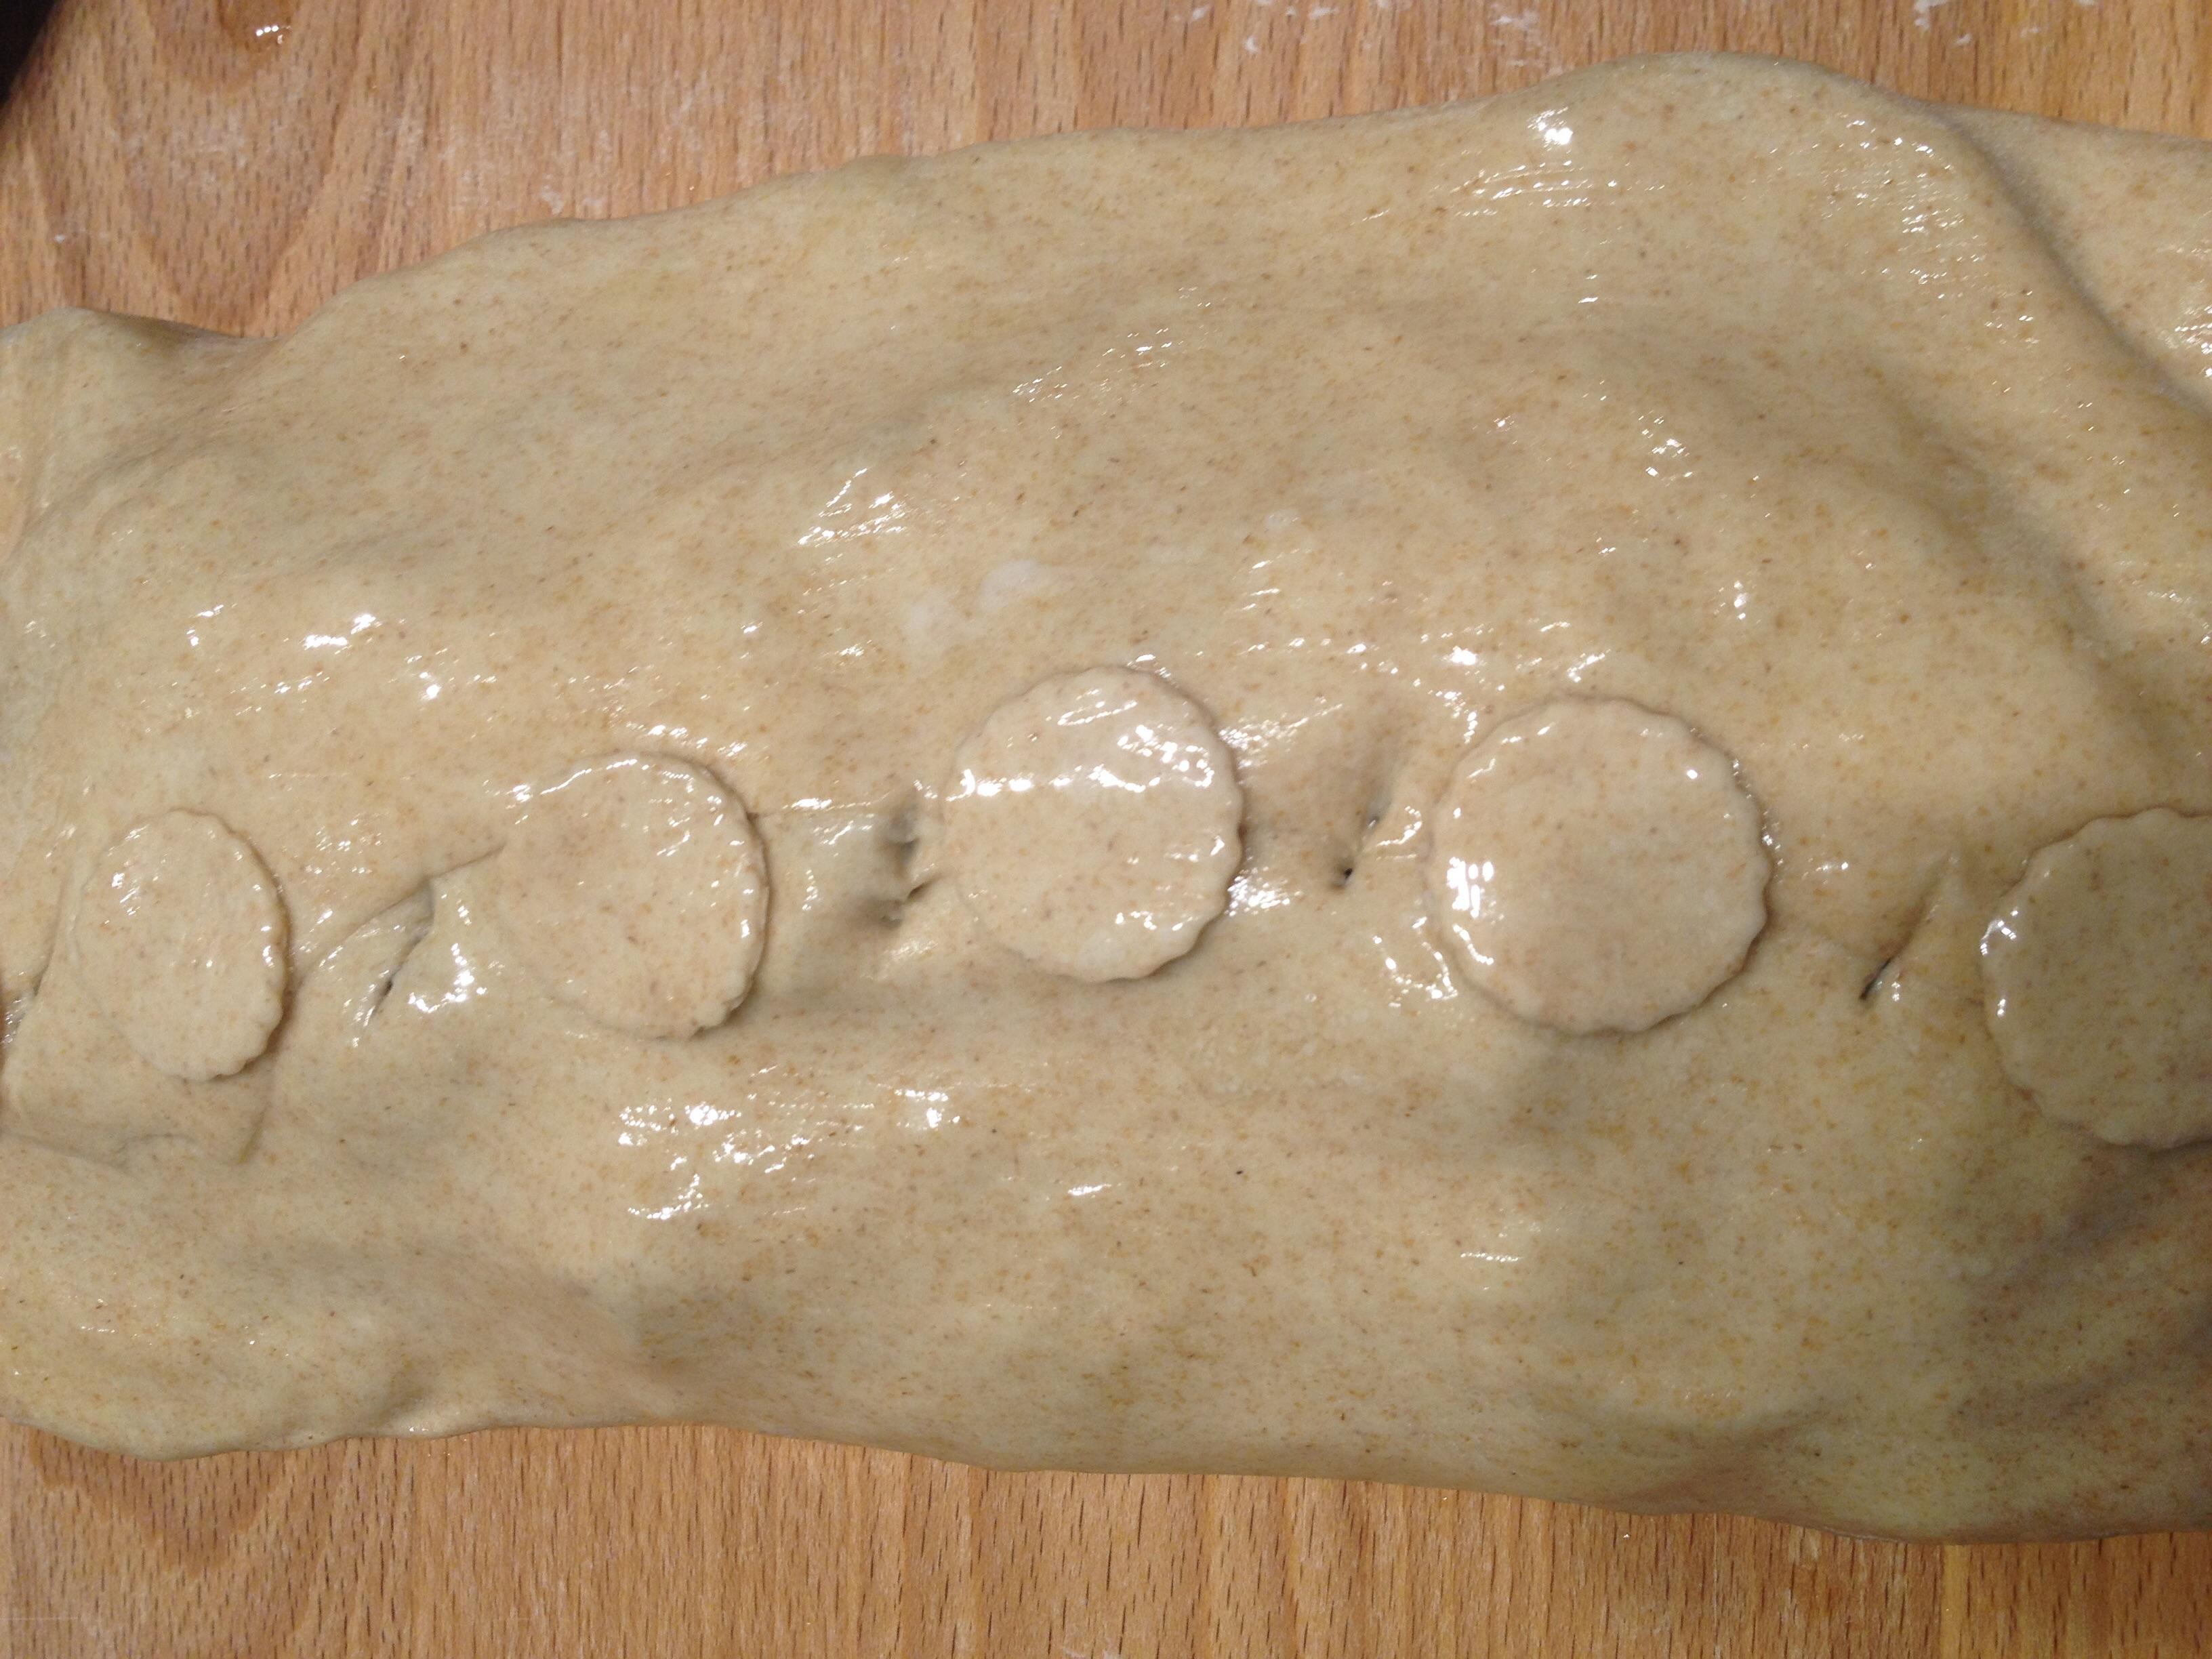 Strudel integrale salato